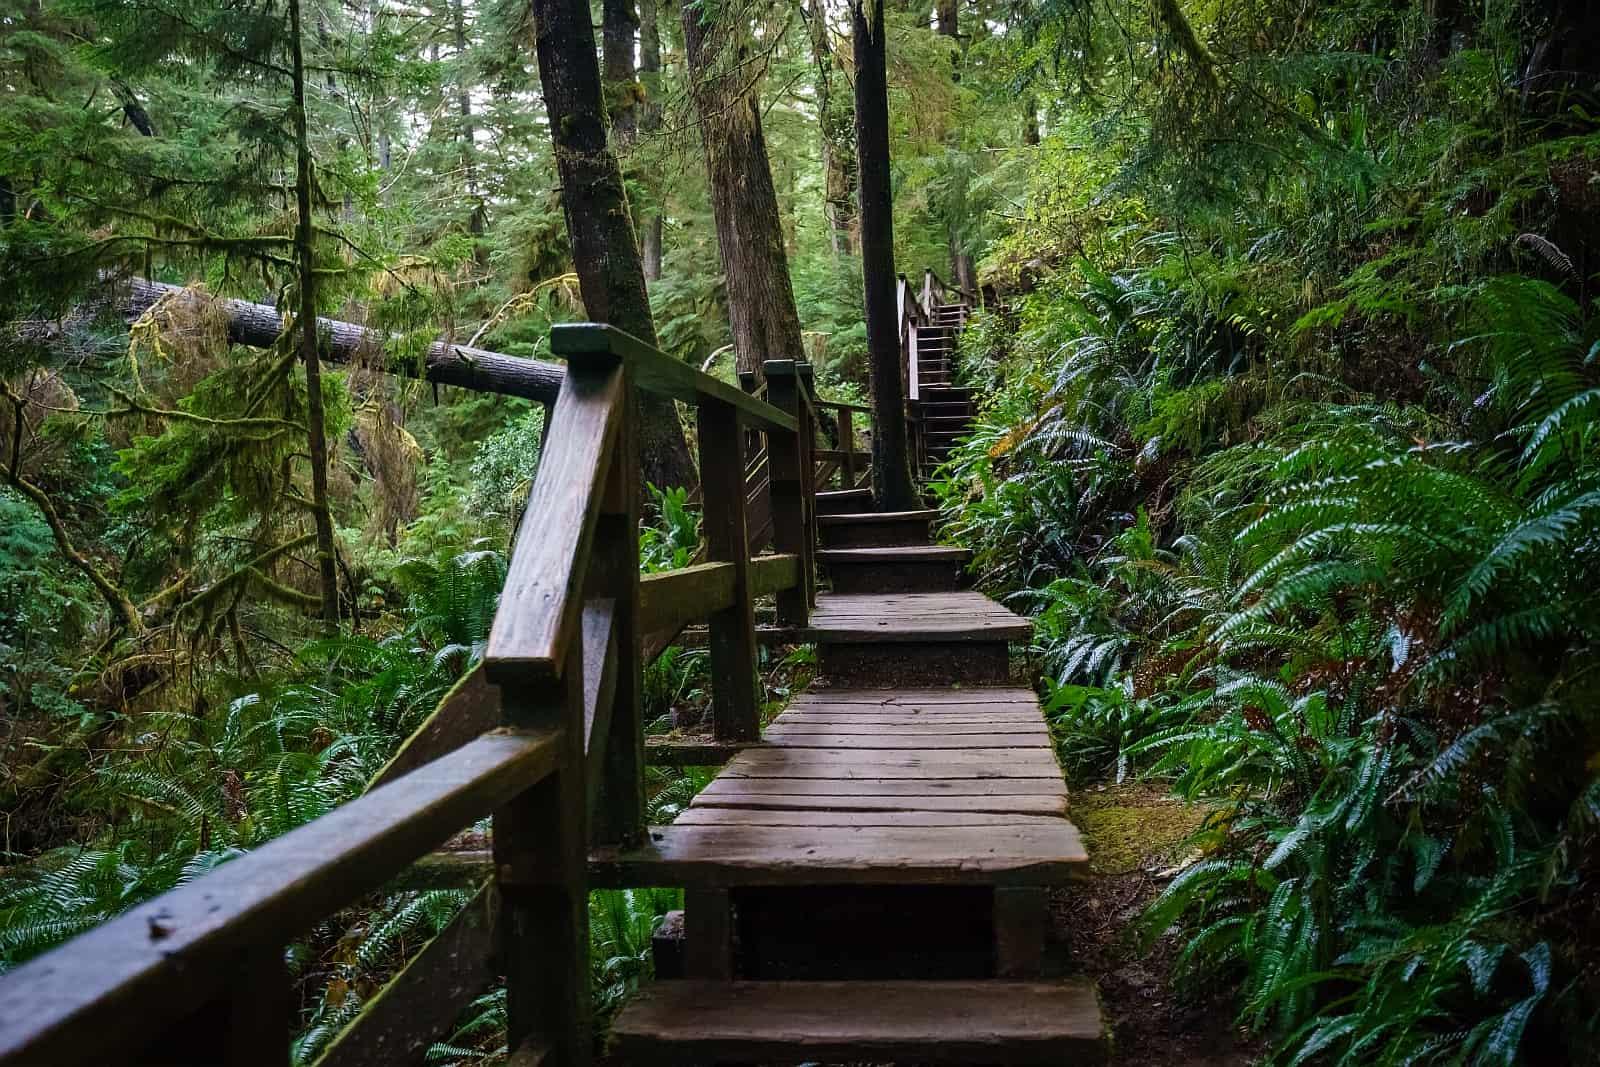 Vancouver Island - Tolle Trails im Regenwald